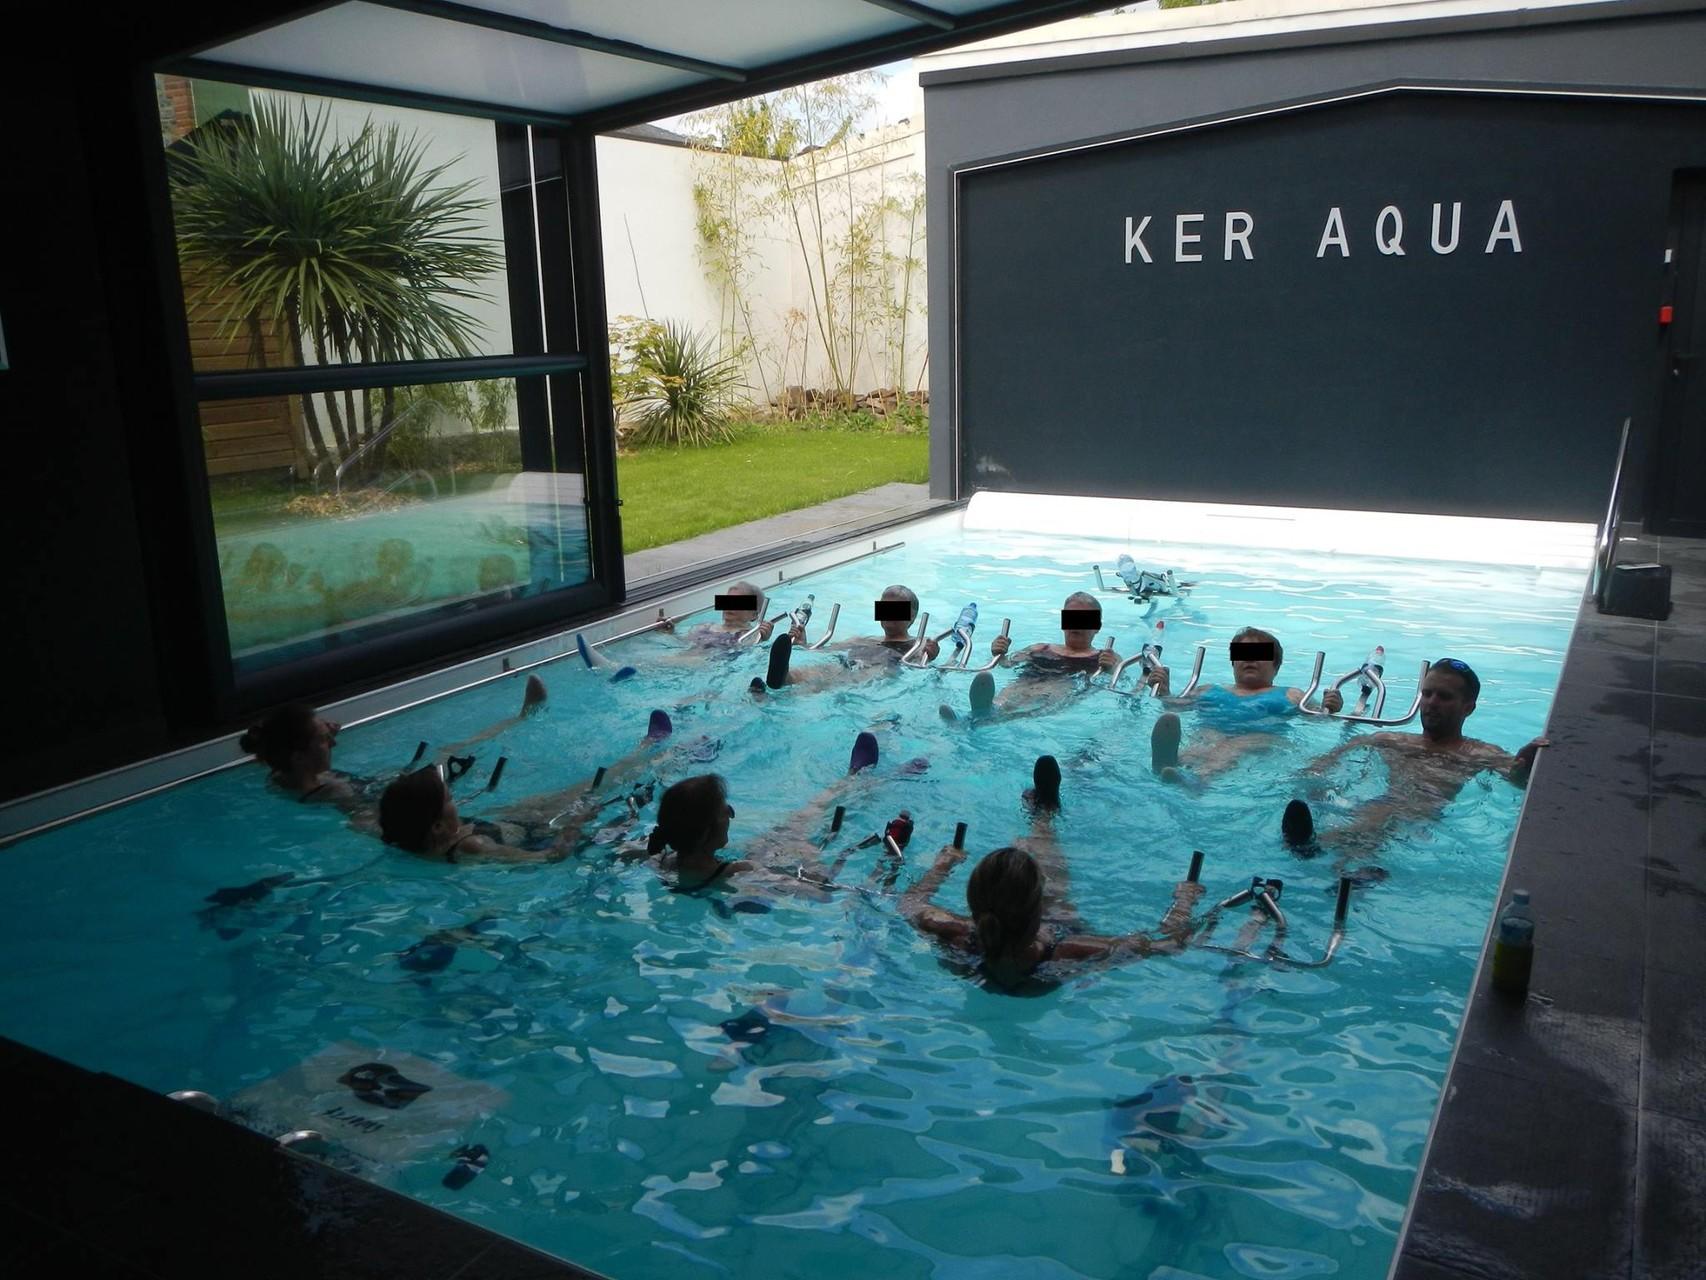 abdos piscine rennes aquabike keraqua